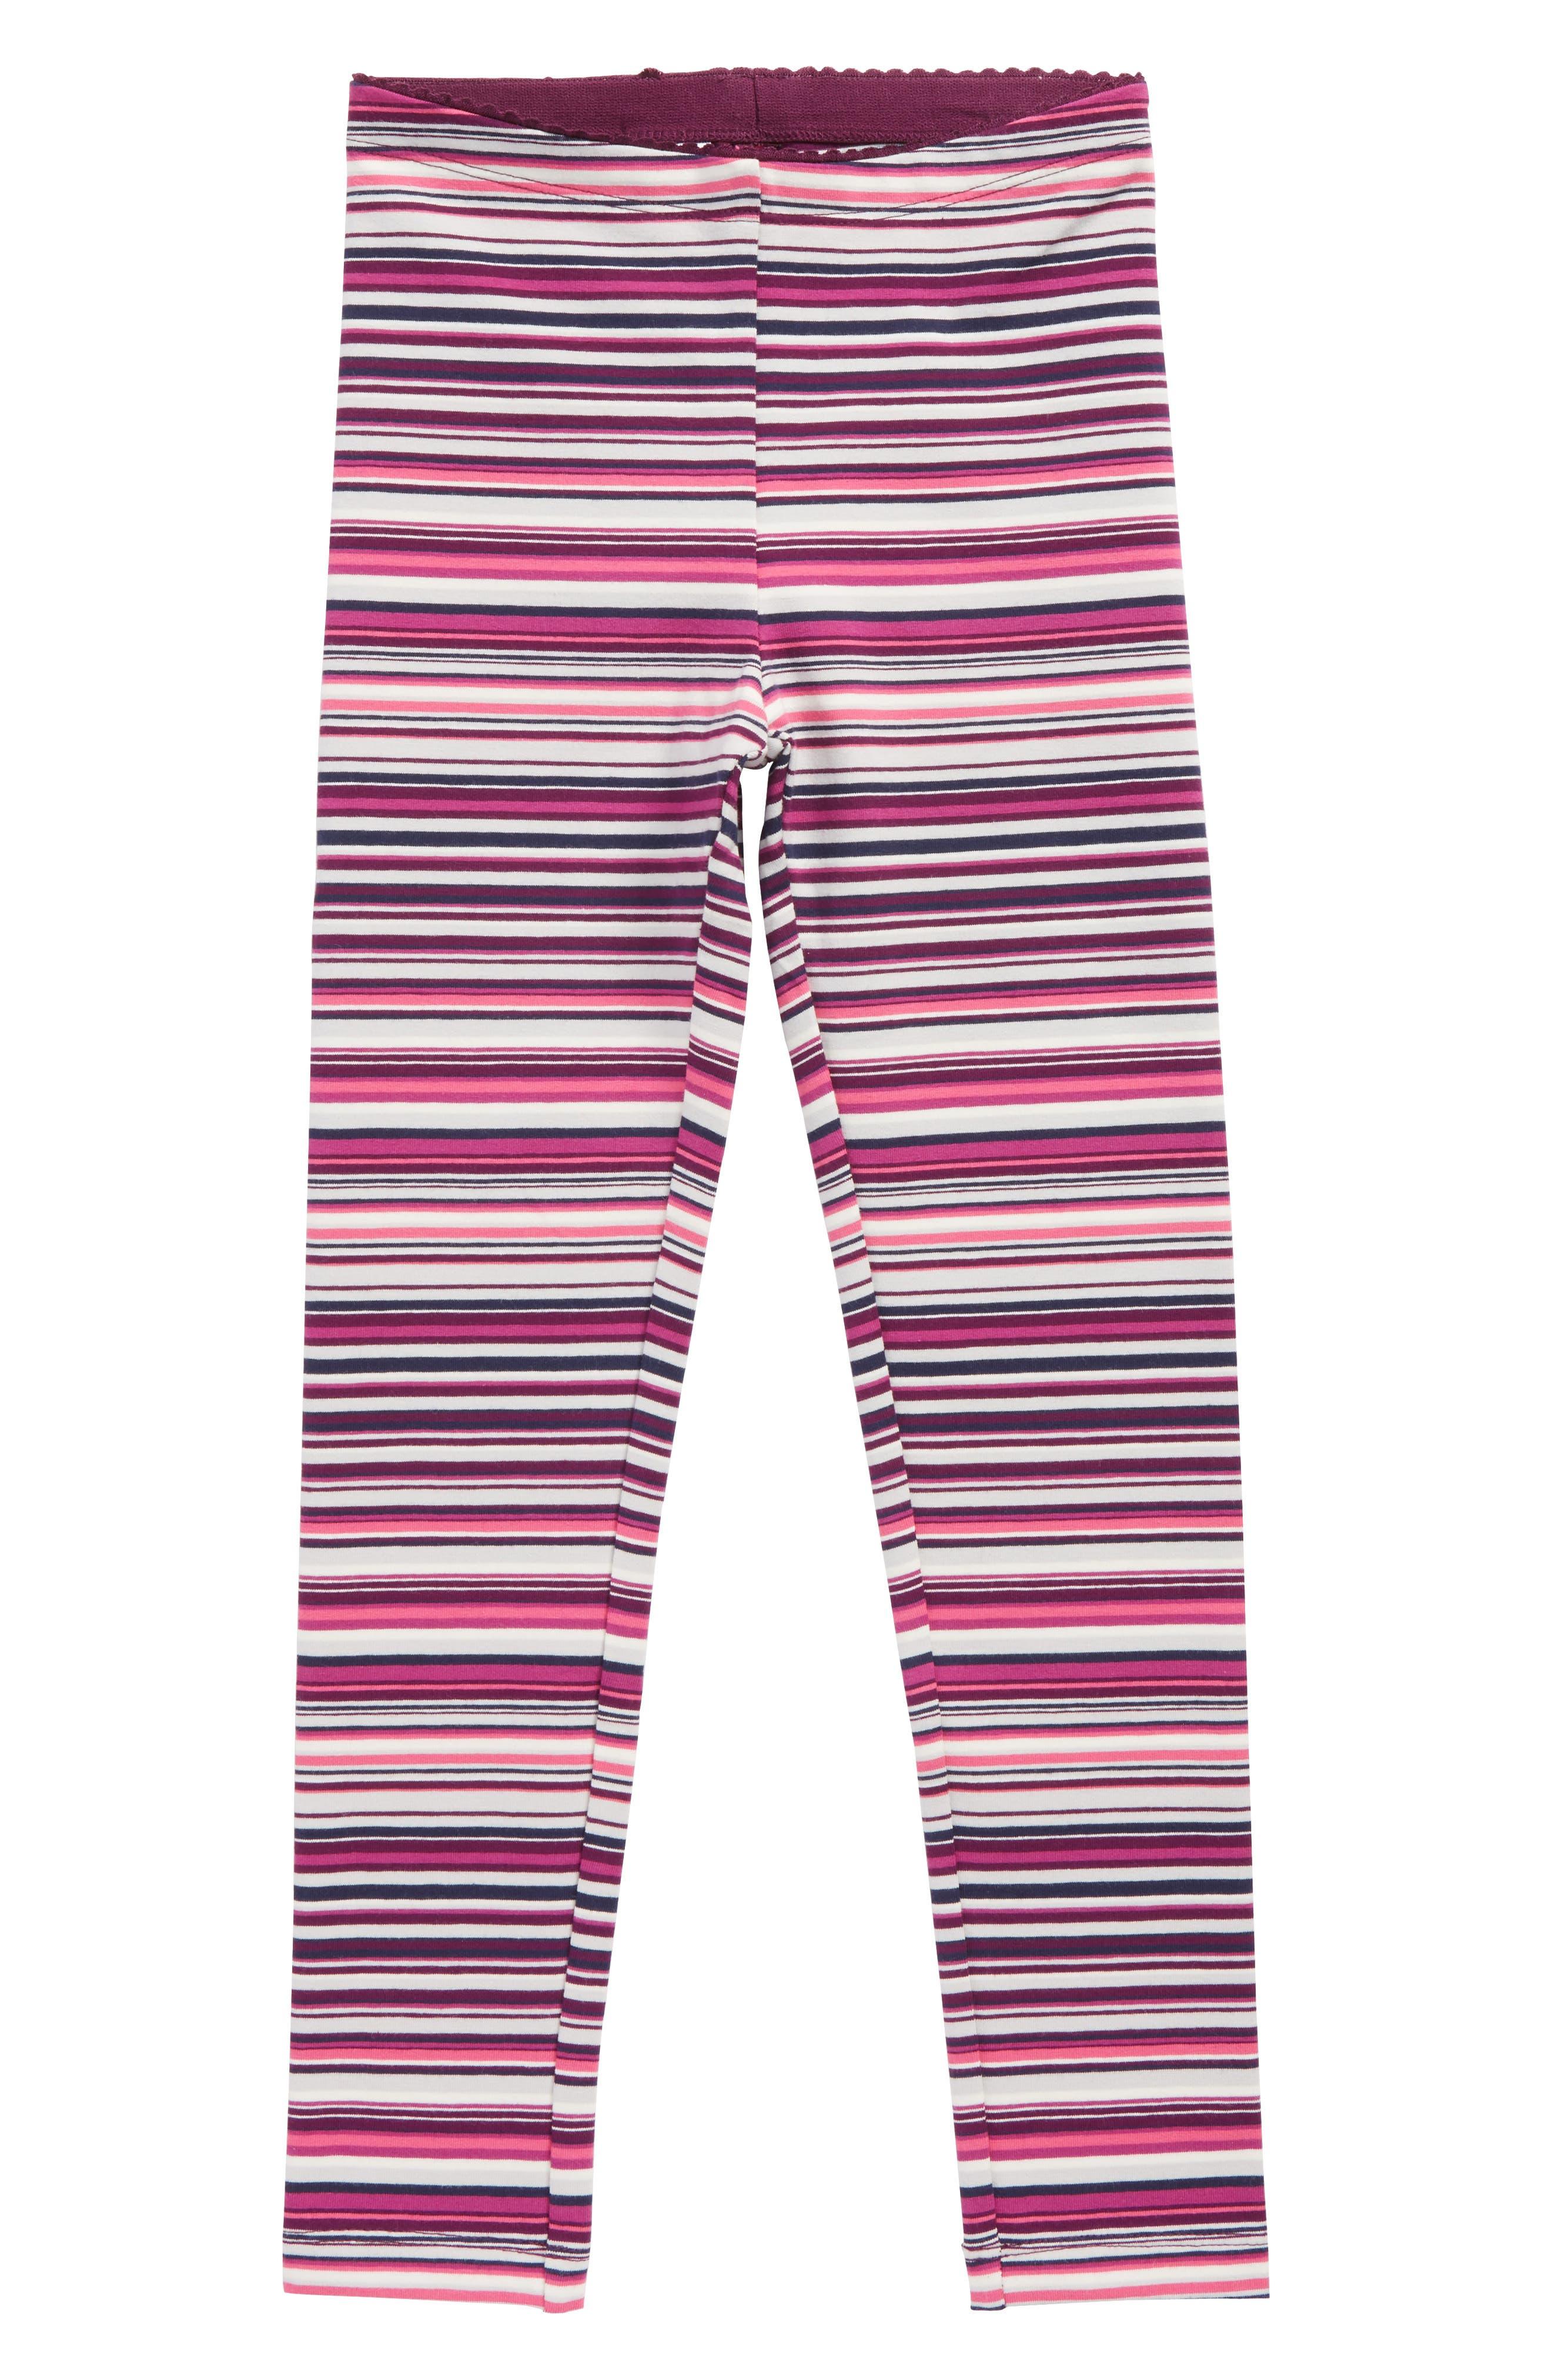 Alternate Image 1 Selected - Tea Collection Multistripe Leggings (Toddler Girls, Little Girls & Big Girls)